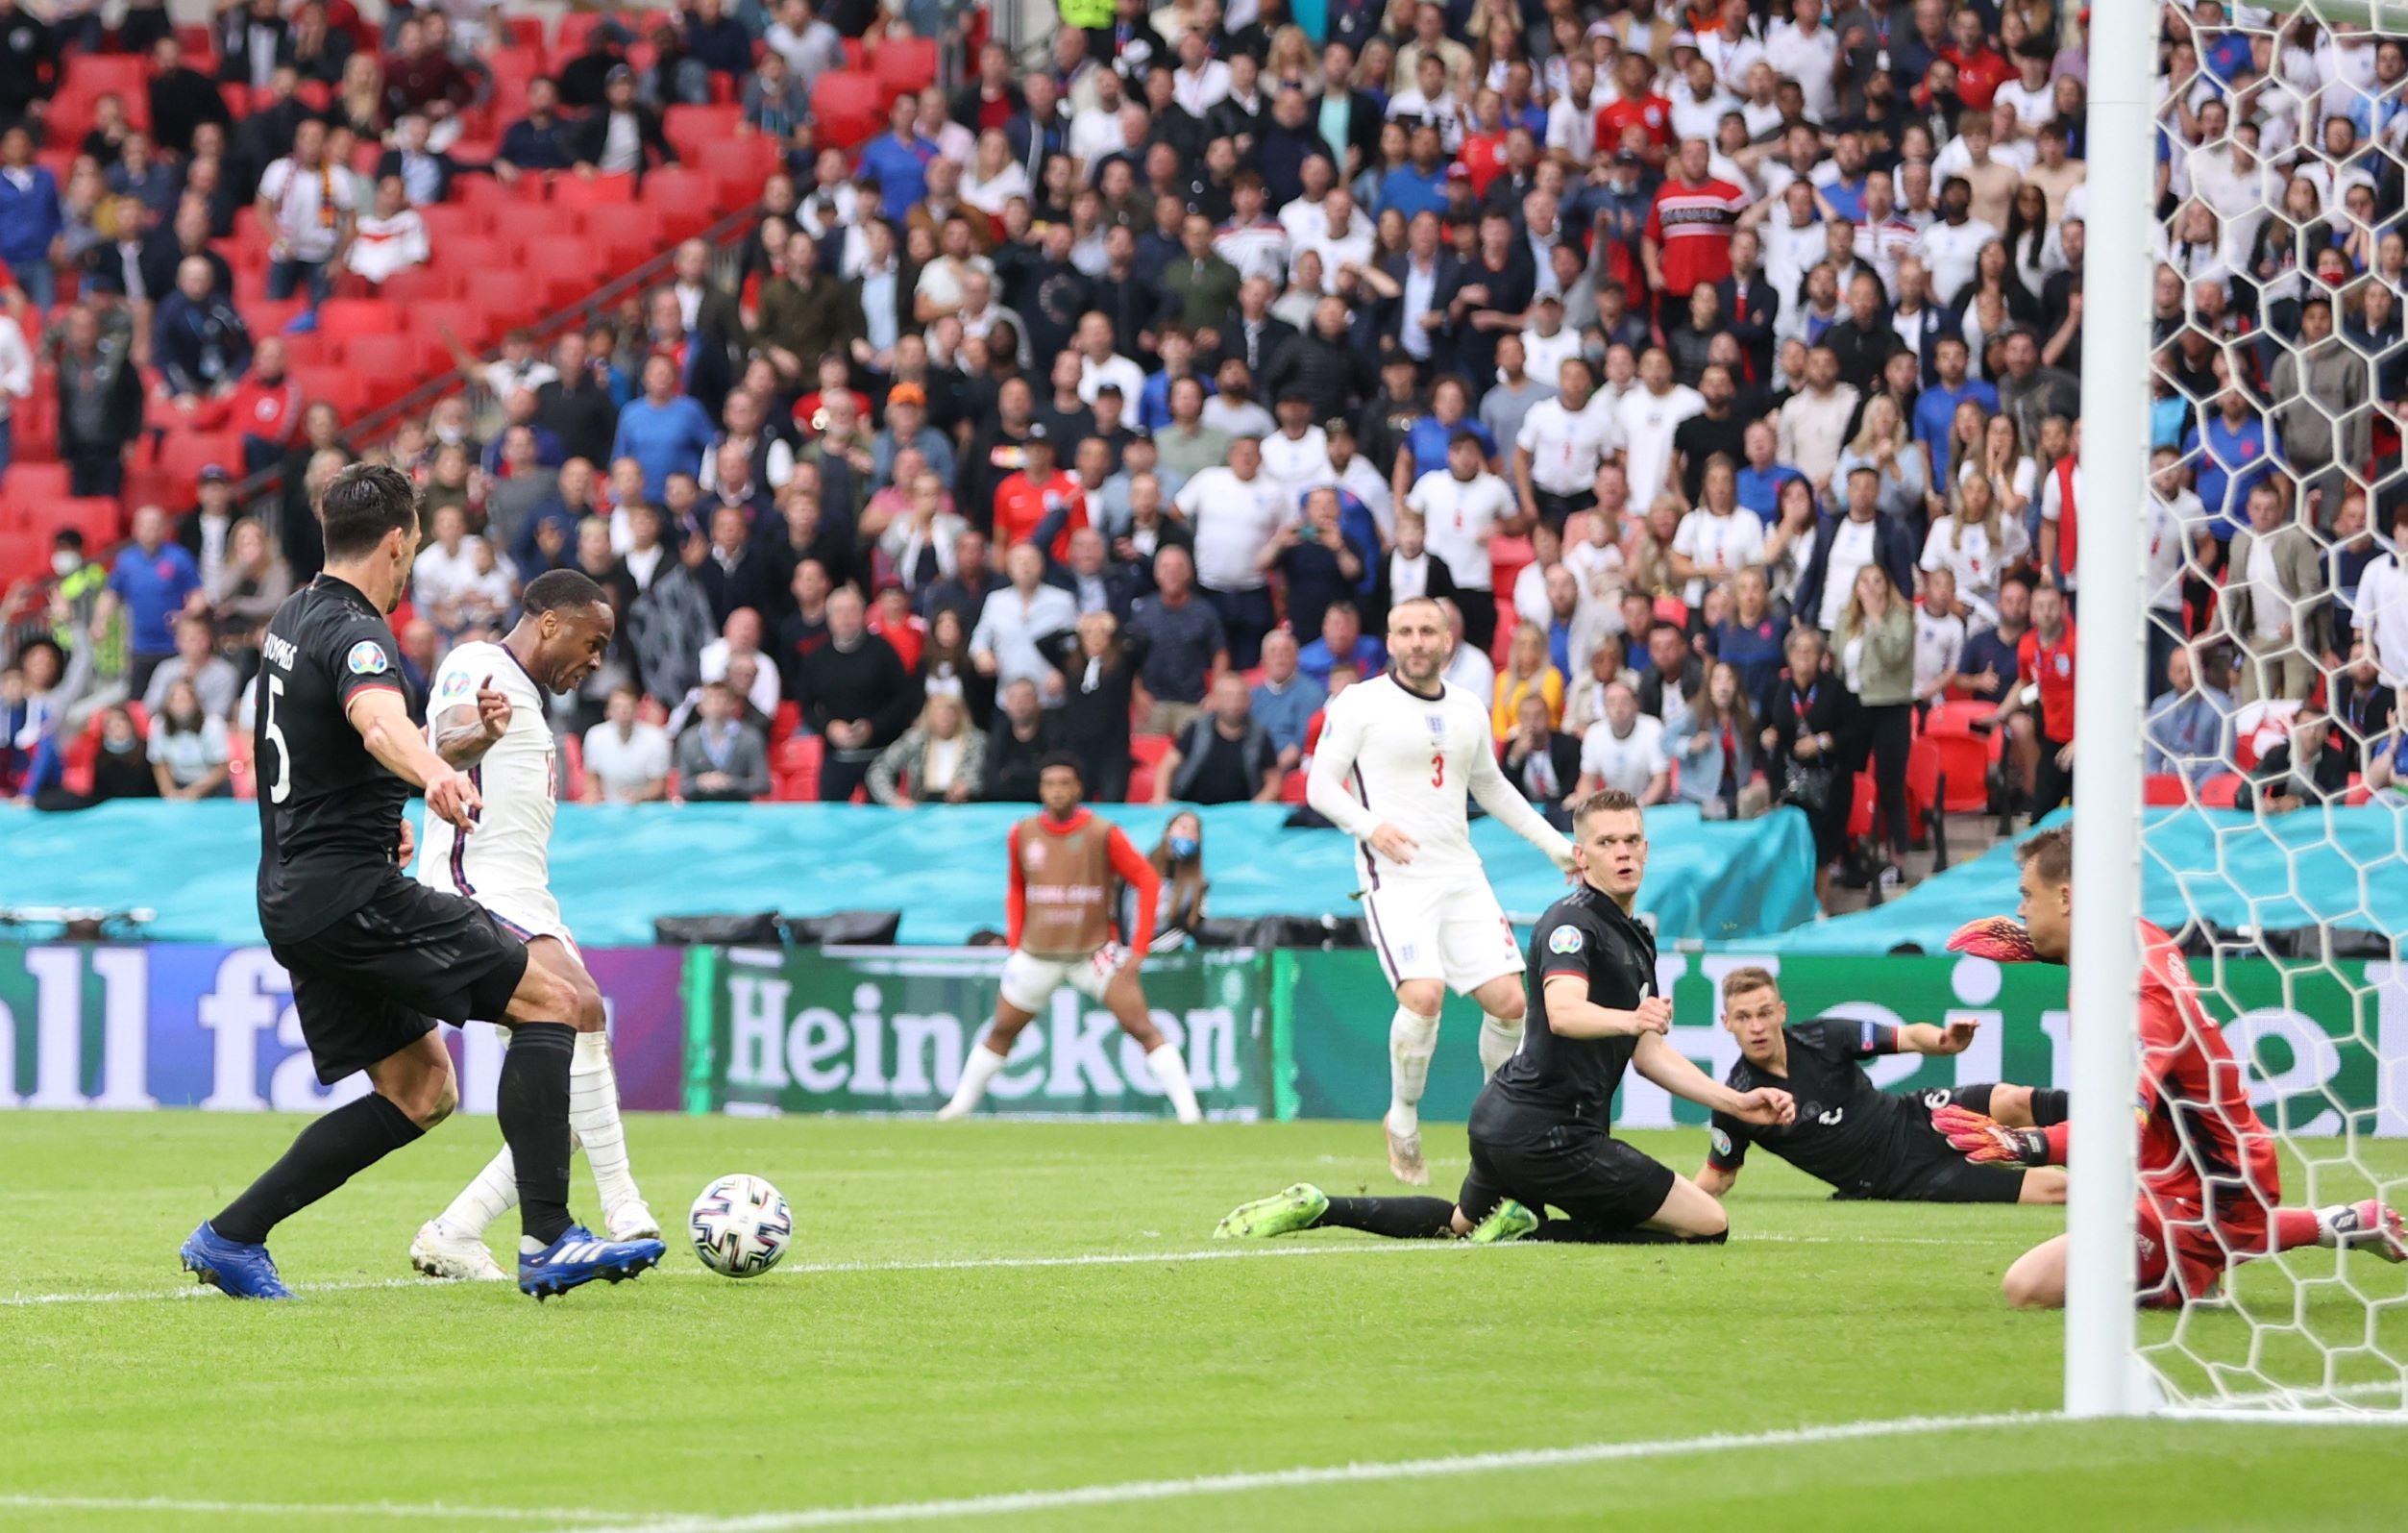 EURO 2020 Fantasy quarter-finals: Best players, team reveals and injury news